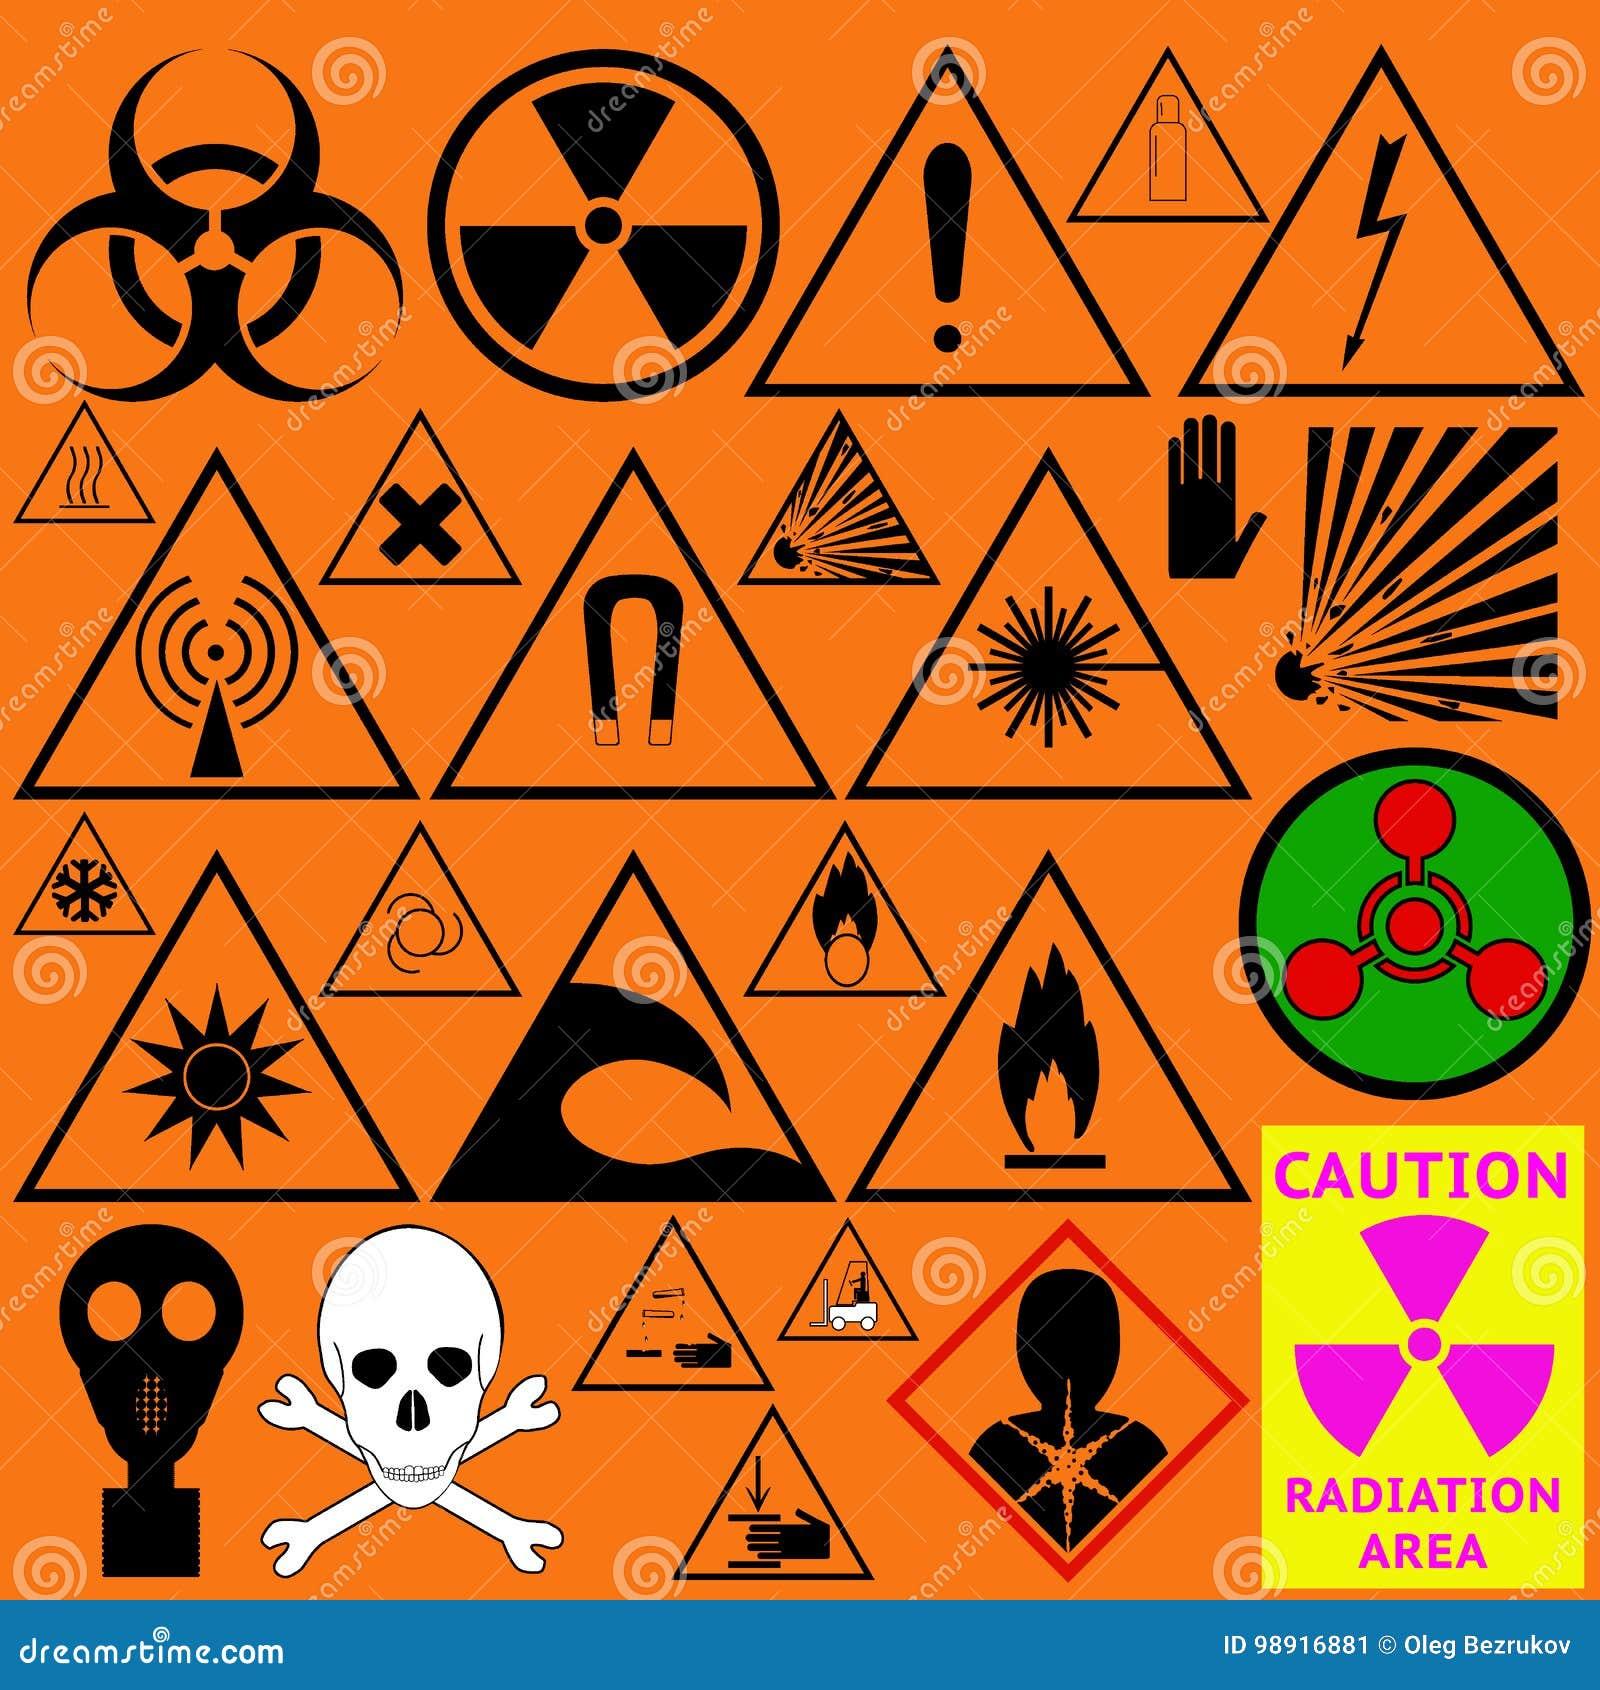 Hazard symbol for toxic image collections symbol and sign ideas set of hazard symbols biological radiation chemical and other set of hazard symbols biological radiation chemical buycottarizona